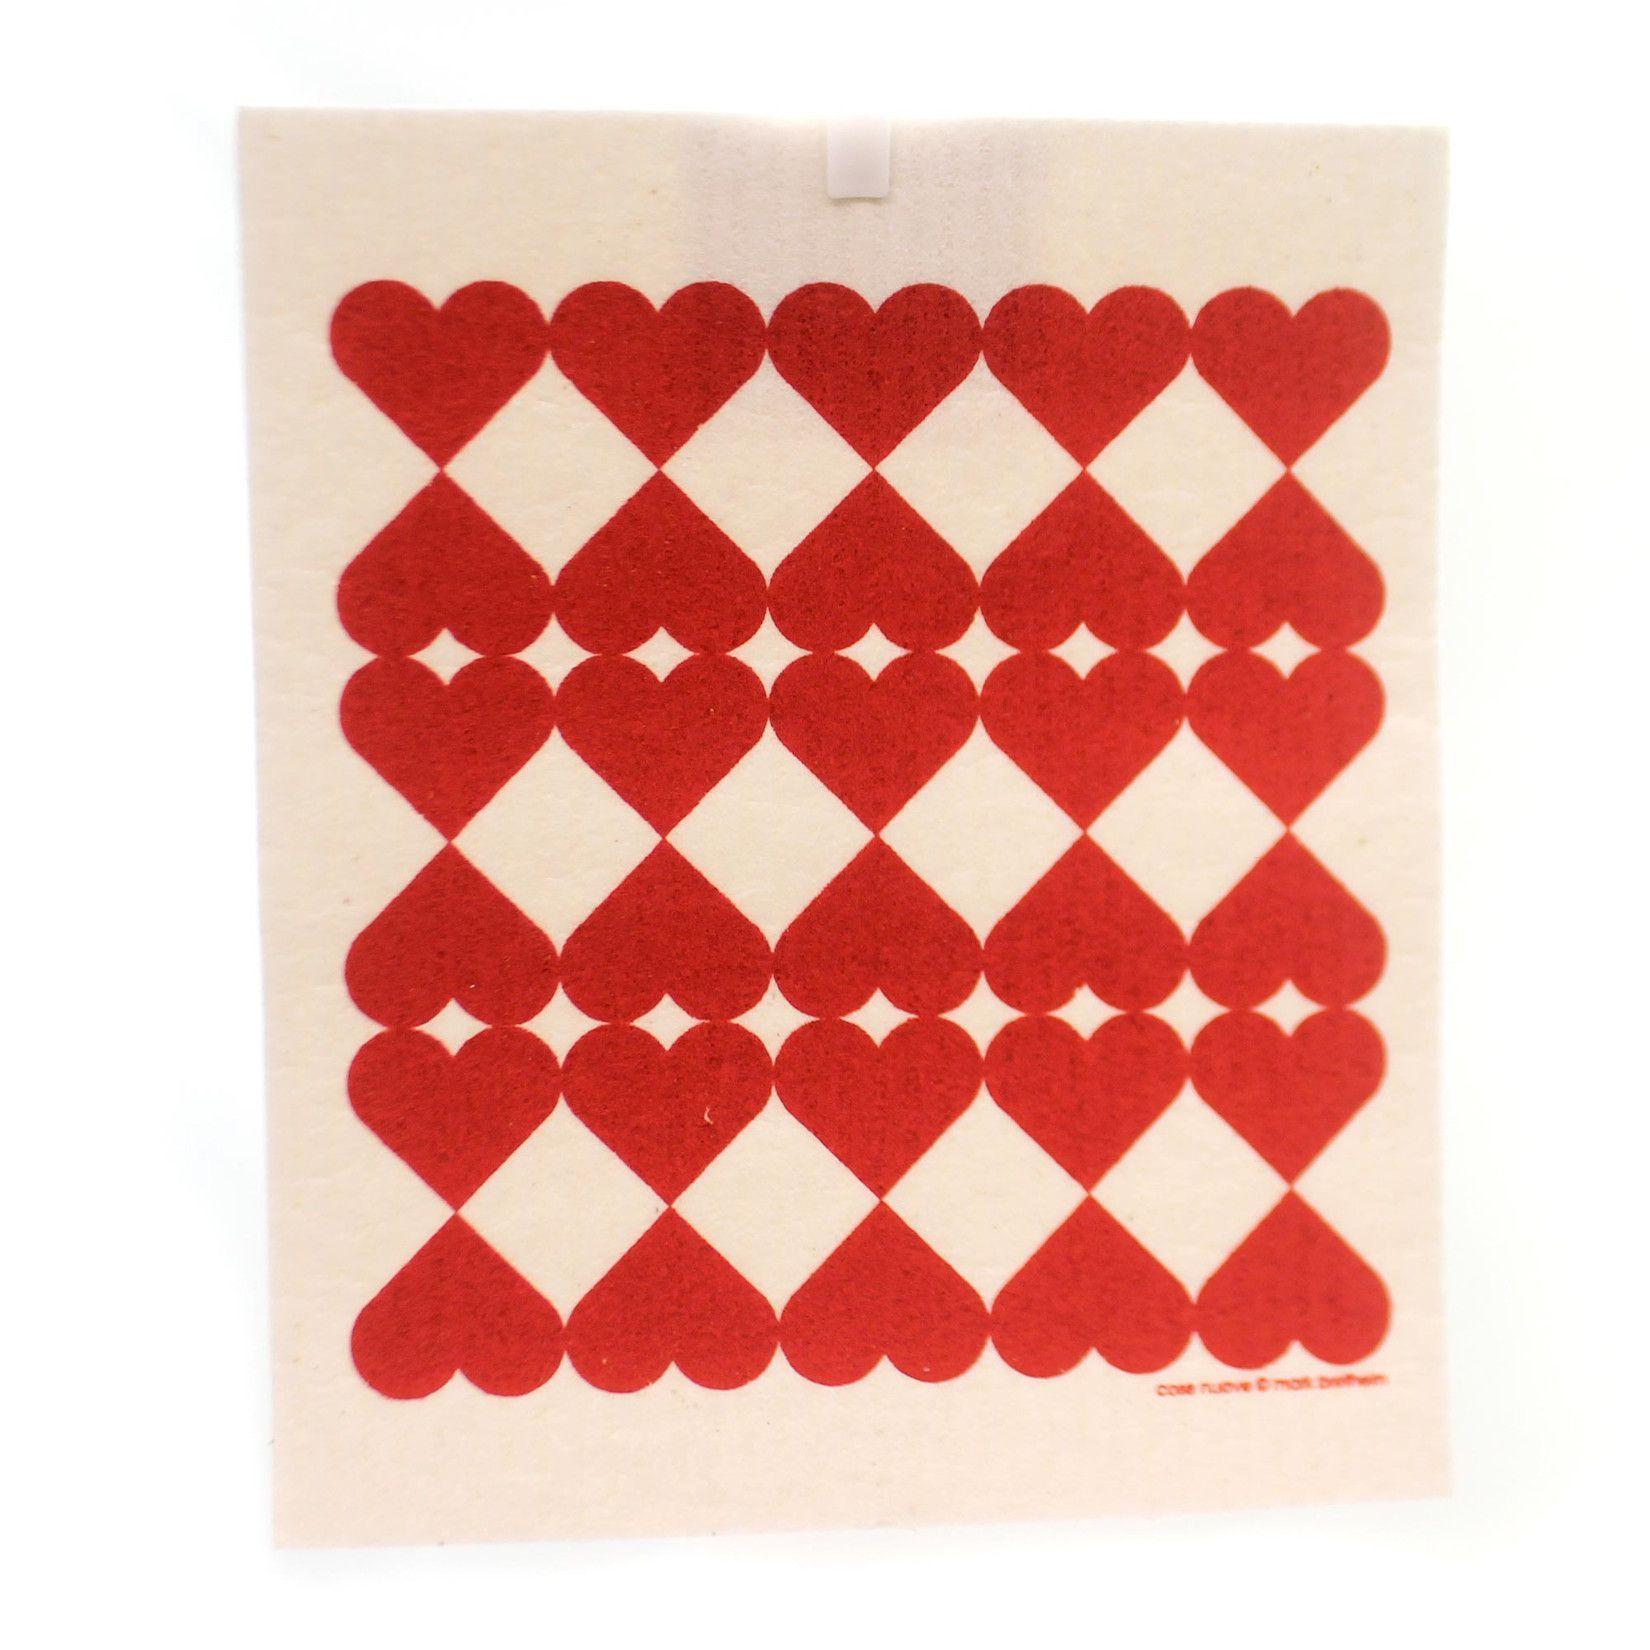 Swedish Dish Cloth Harlequin Hearts Decorative Towel